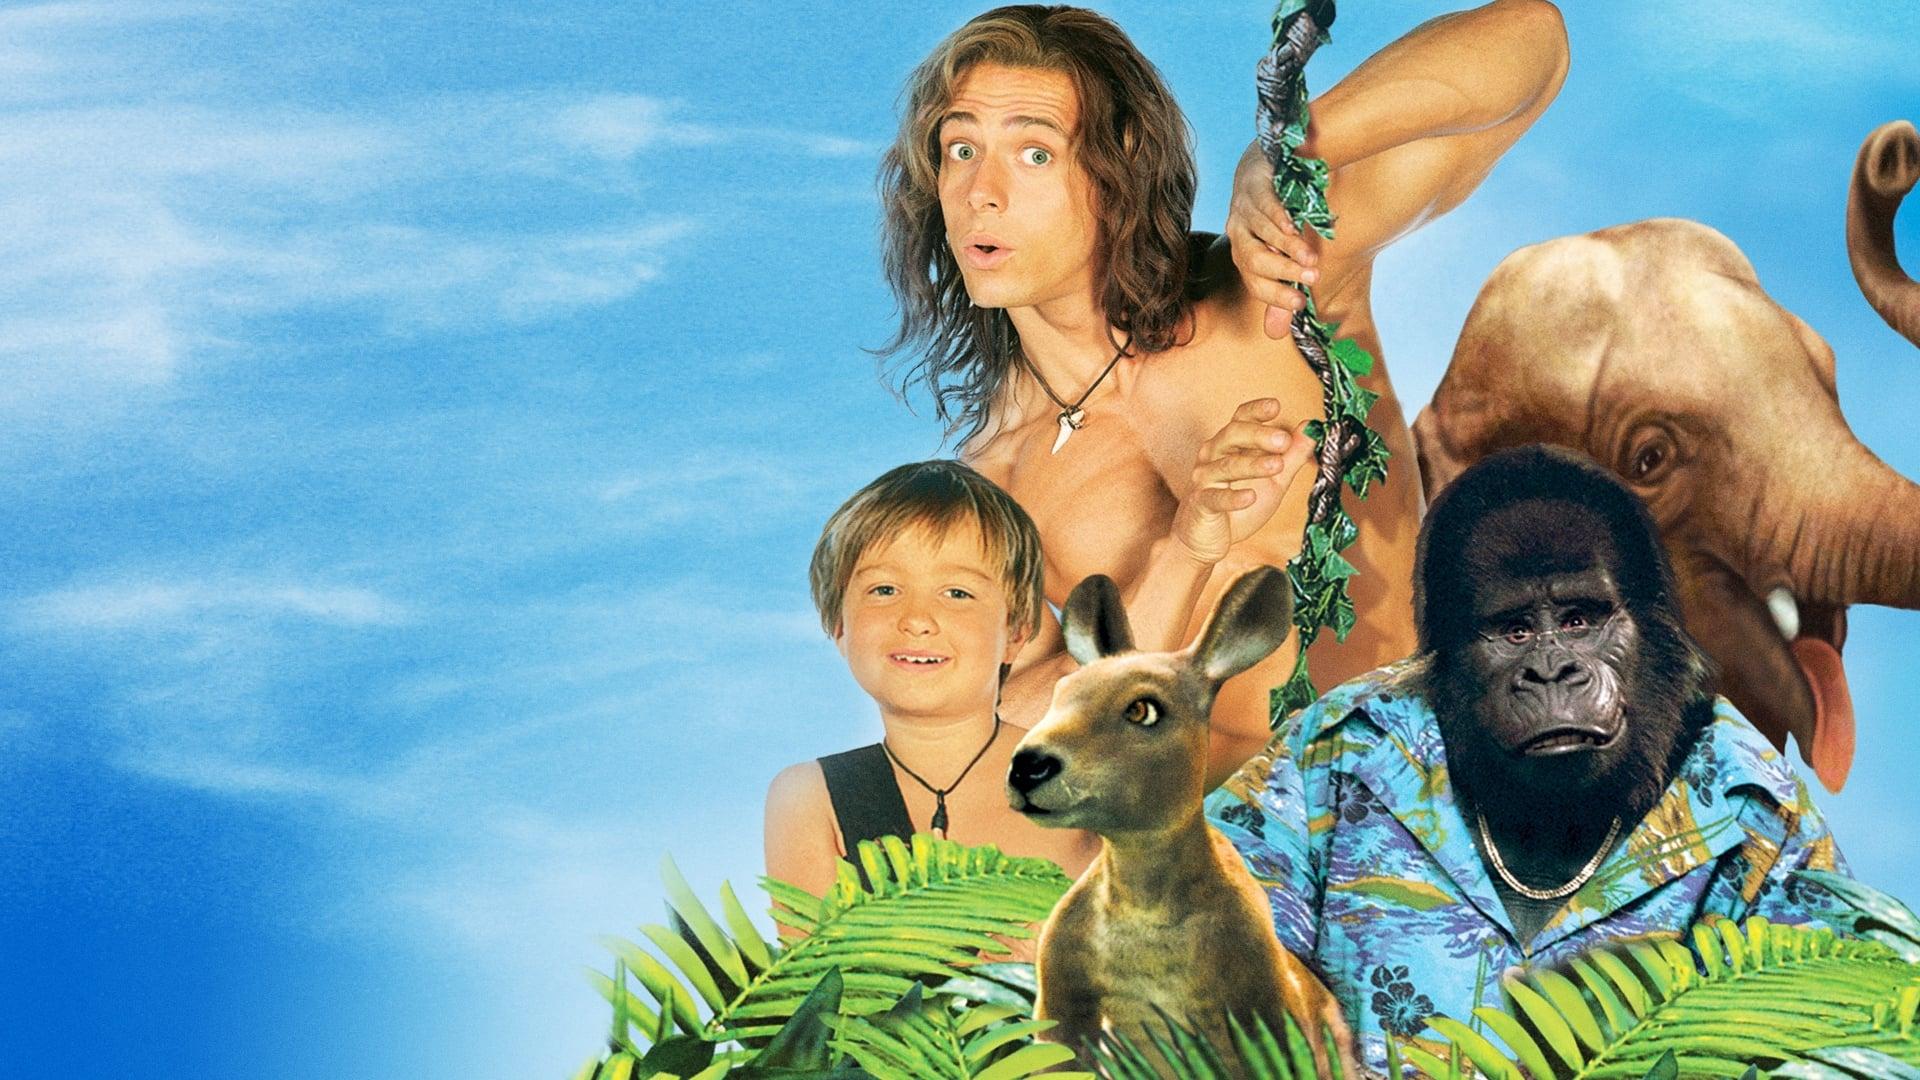 George of the Jungle 2 Movie